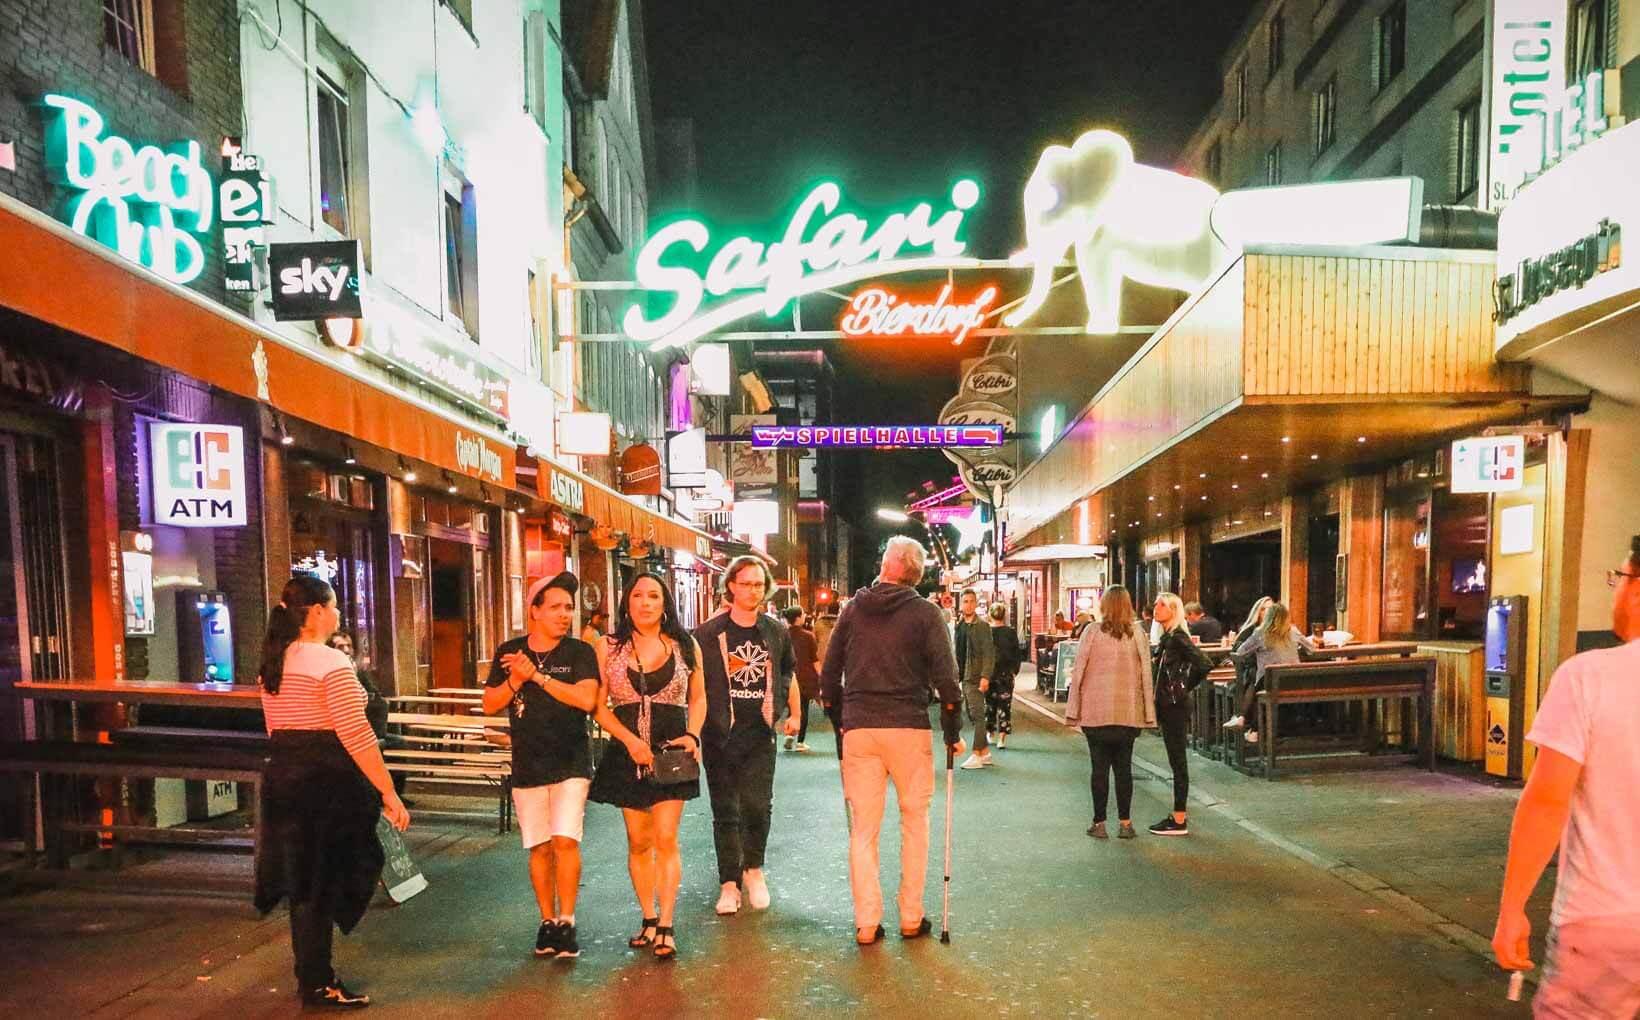 Reeperbahn street. How to Visit Reeperbahn Clubs Festival Like a Pro